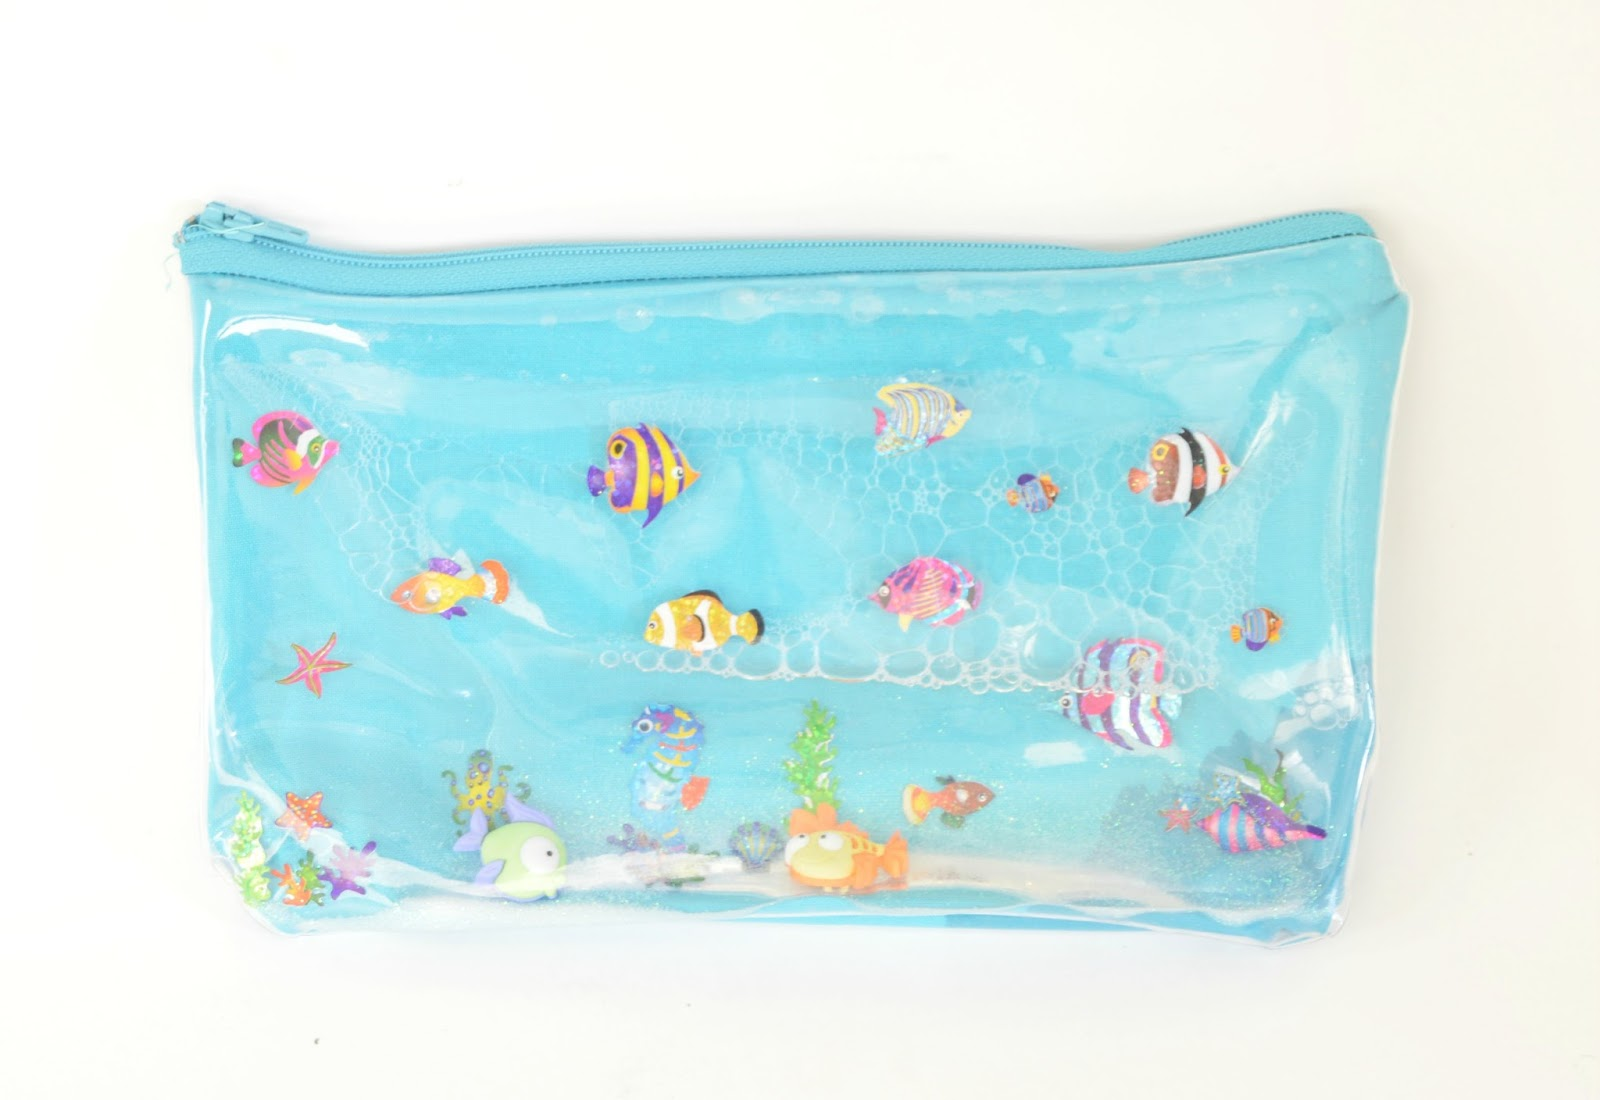 Vikalpah Diy Liquid Pencil Case Under The Sea Theme